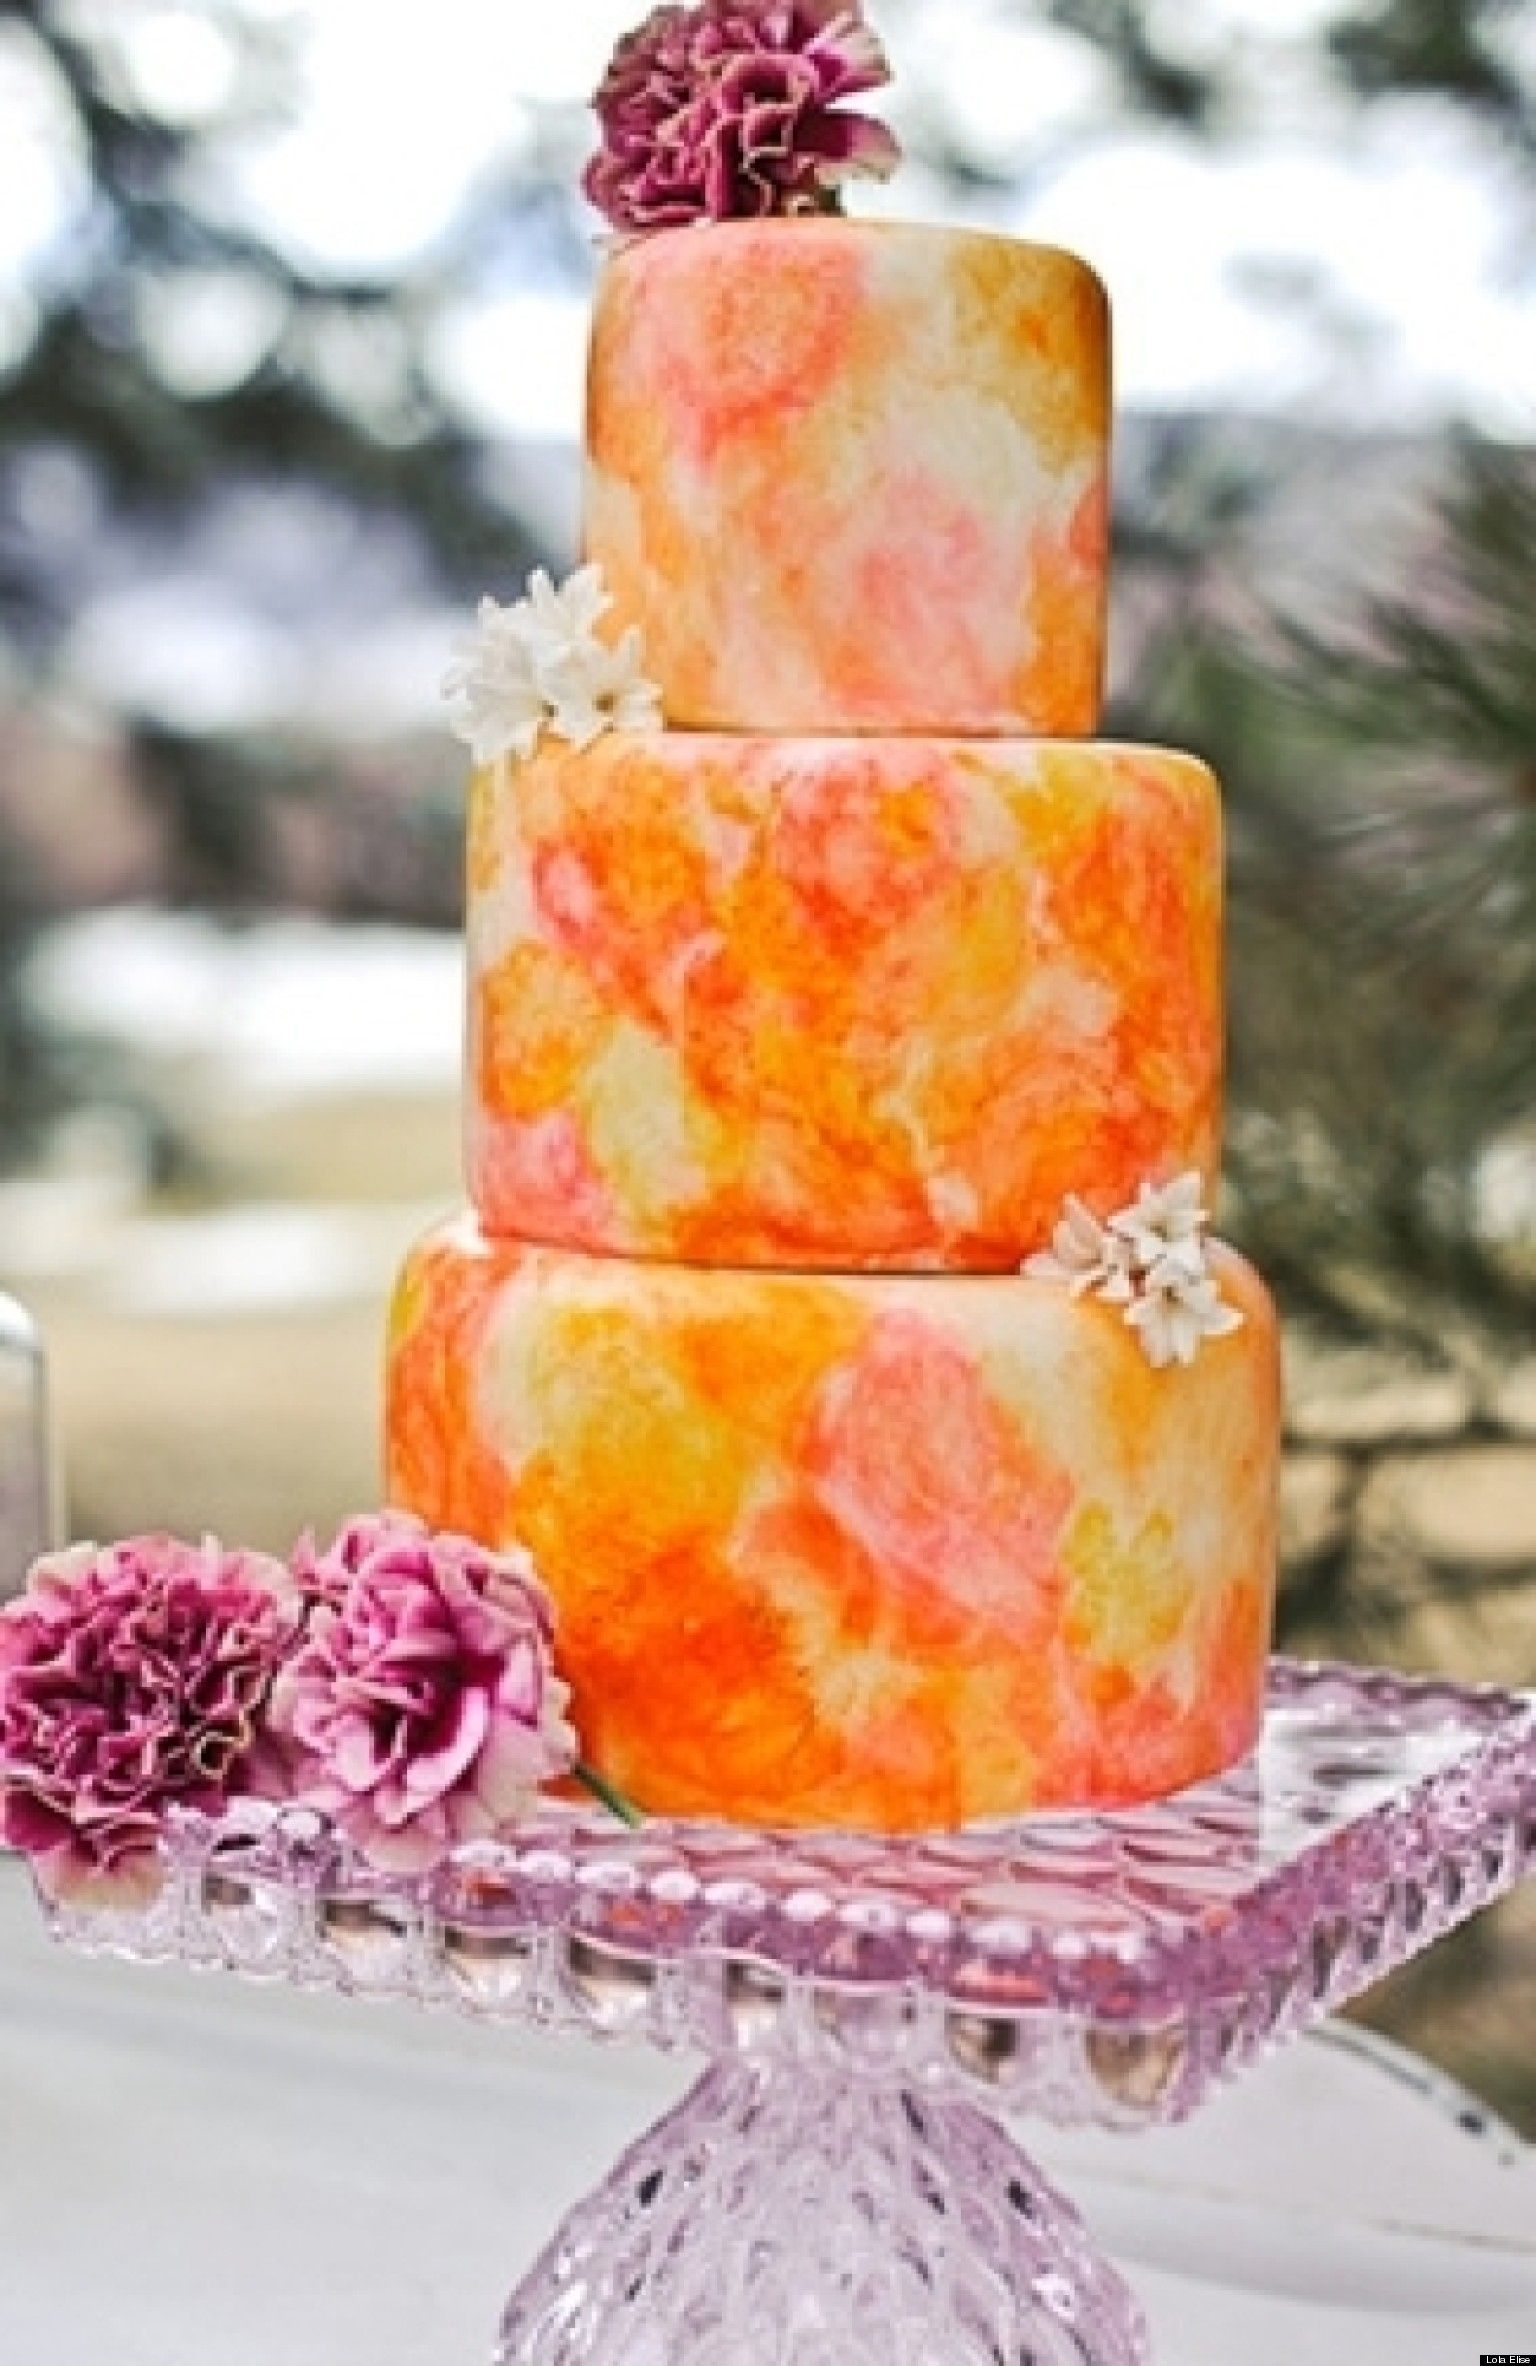 Inspirational Healthy Wedding Cakes Ideas Bruman MMC - Healthy Wedding Cakes